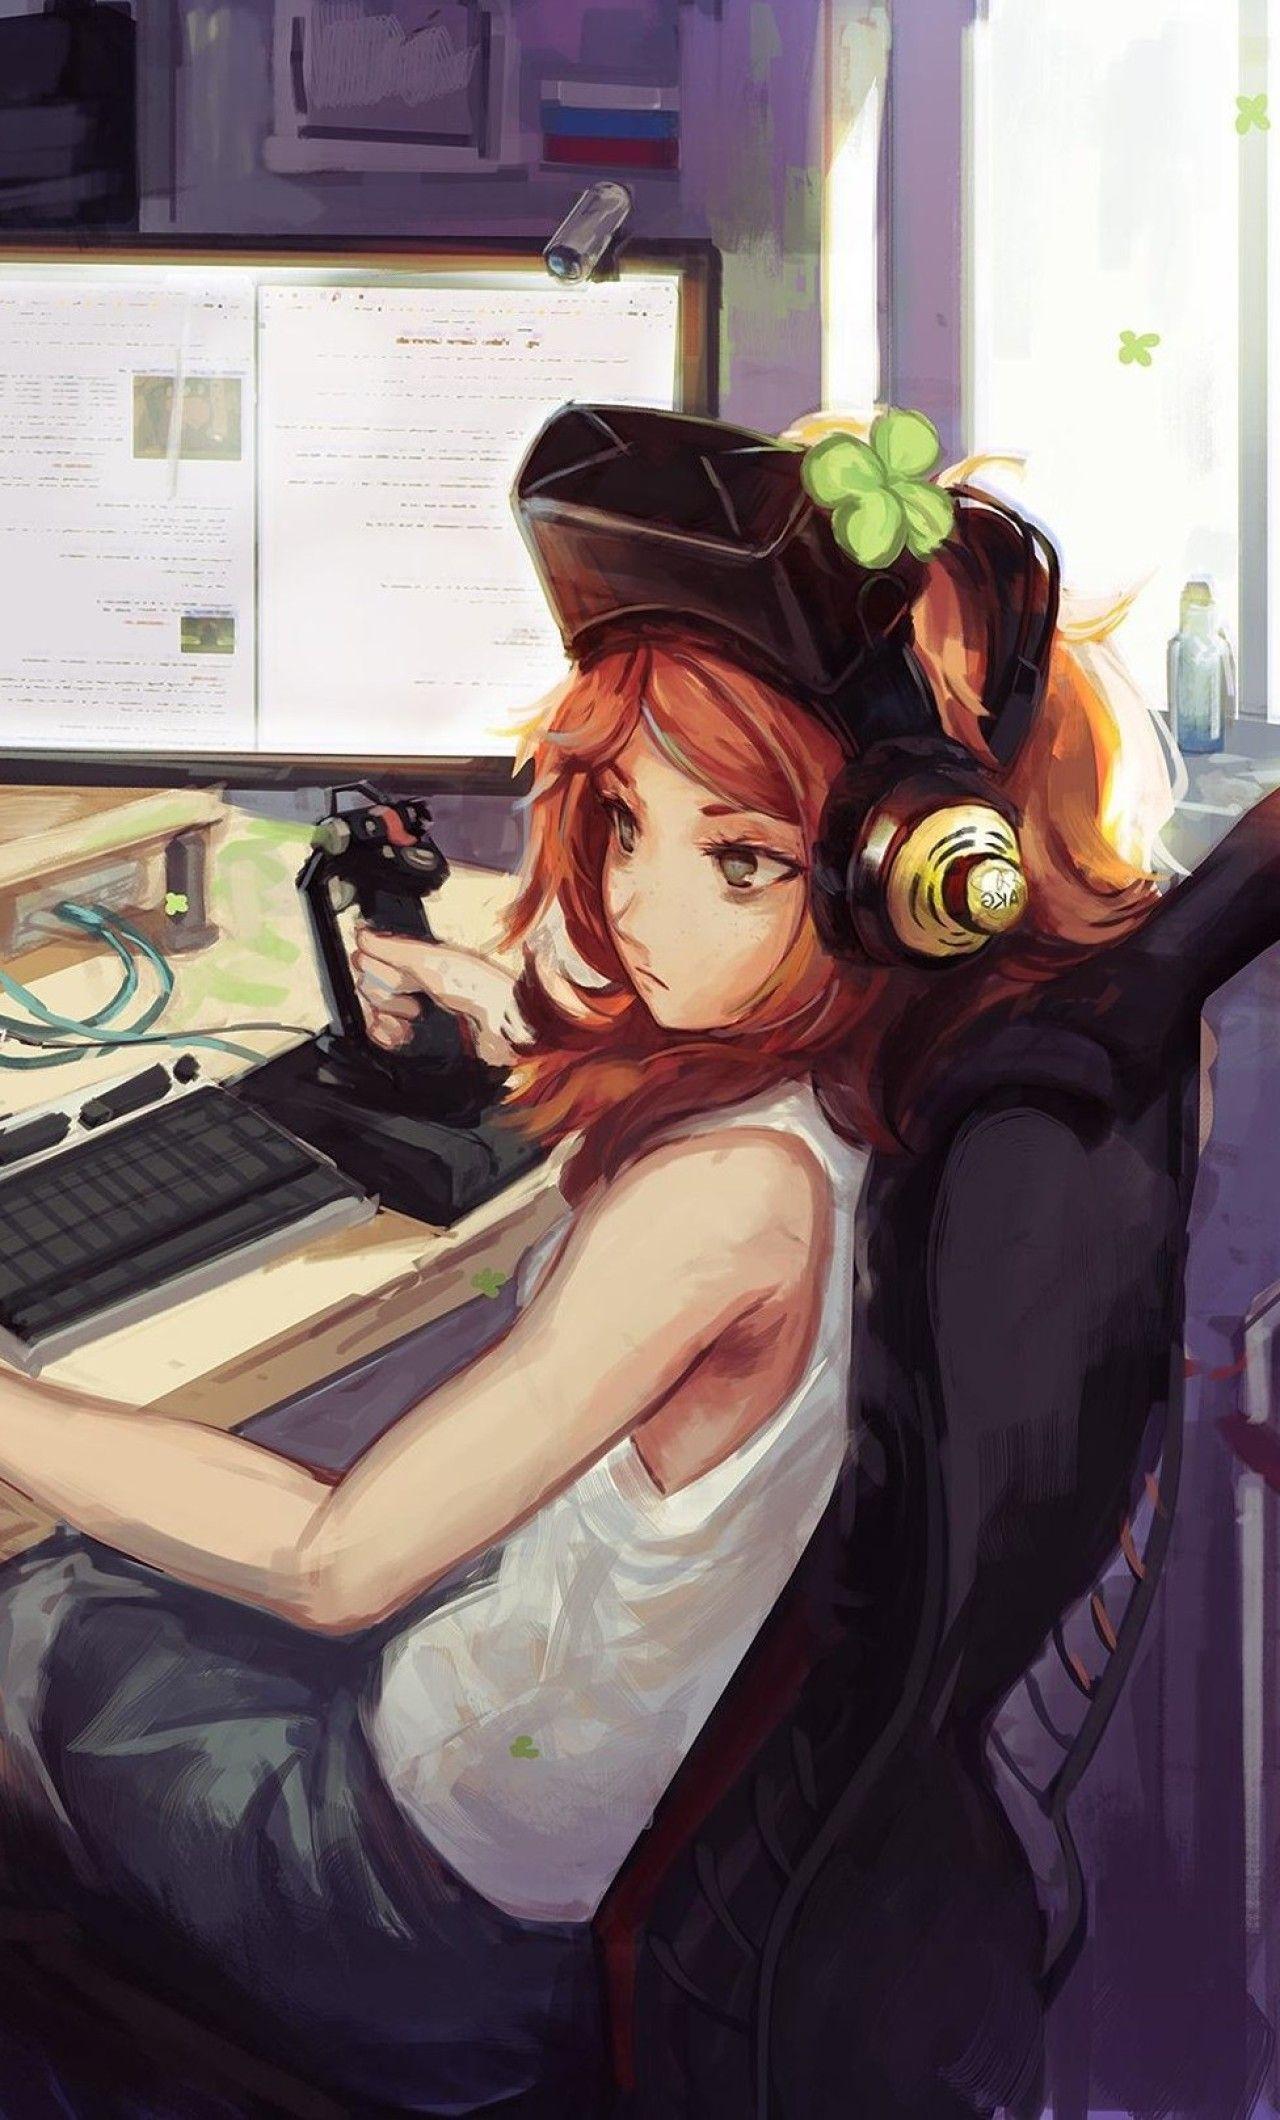 Gamer kawaii anime girl Anime Gamer